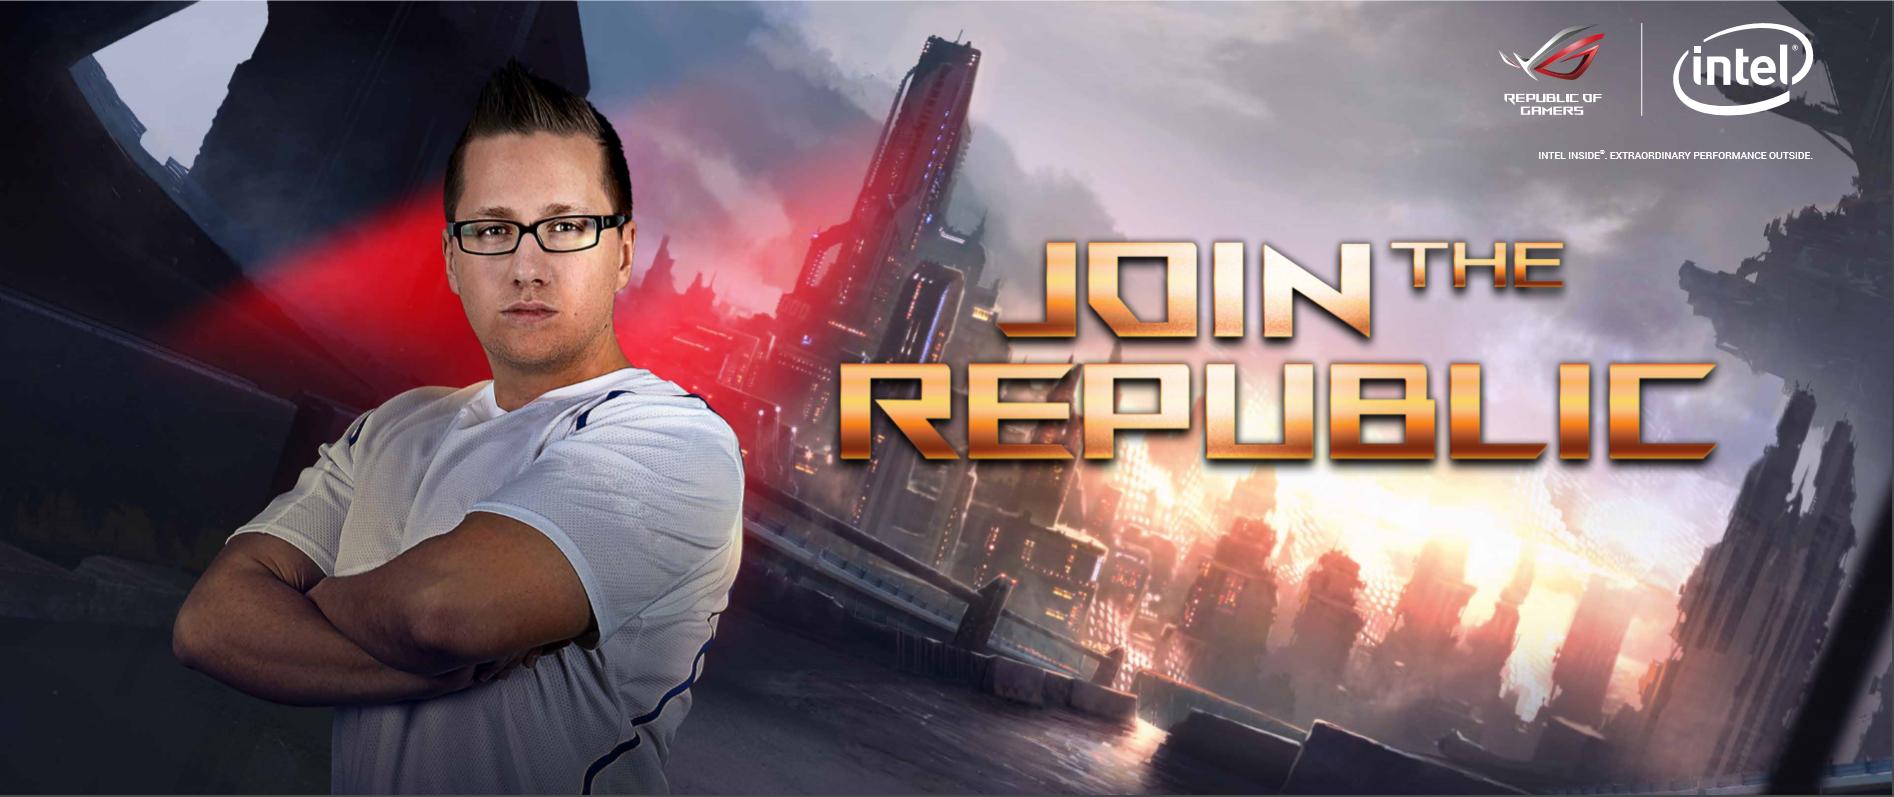 ASUS Republic of Gamers Announces Second Leg of ROG Community Challenge